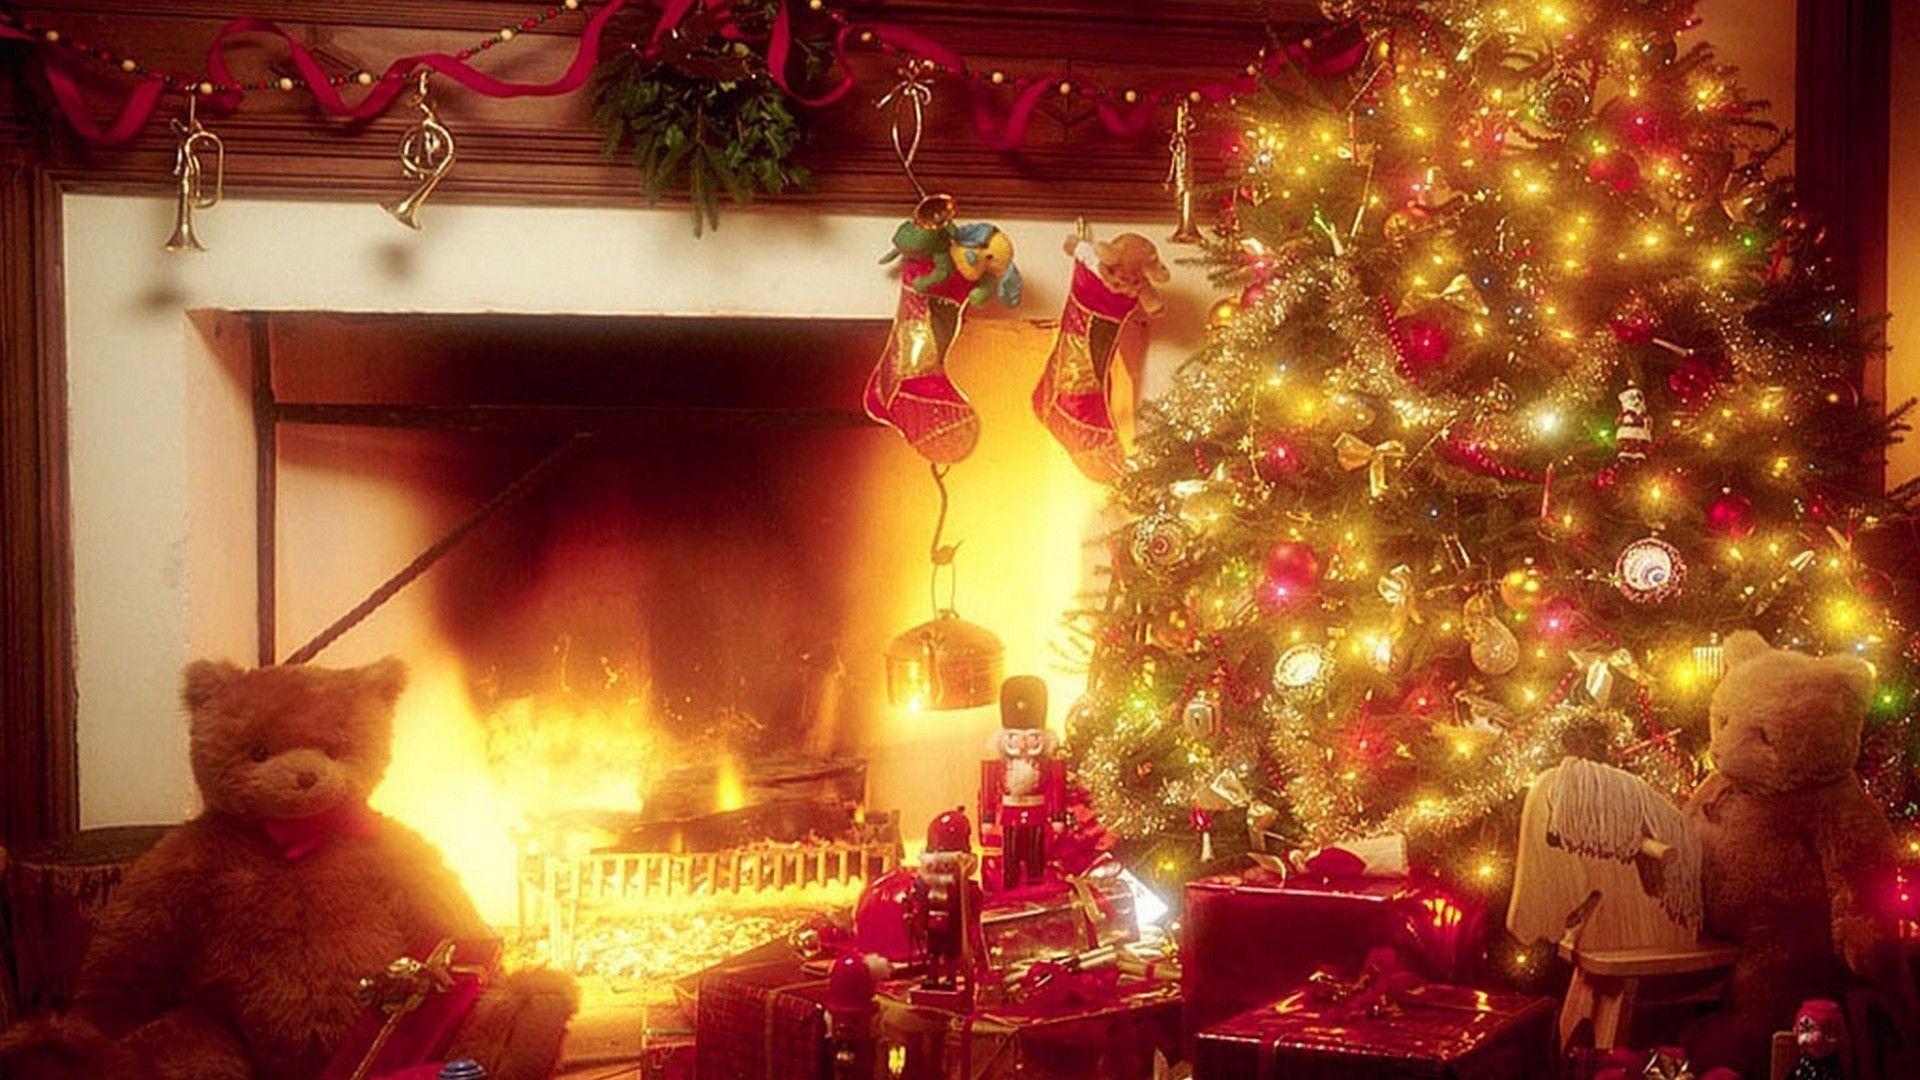 Winter Christmas Desktop Background | Desktop Backgrounds HQ